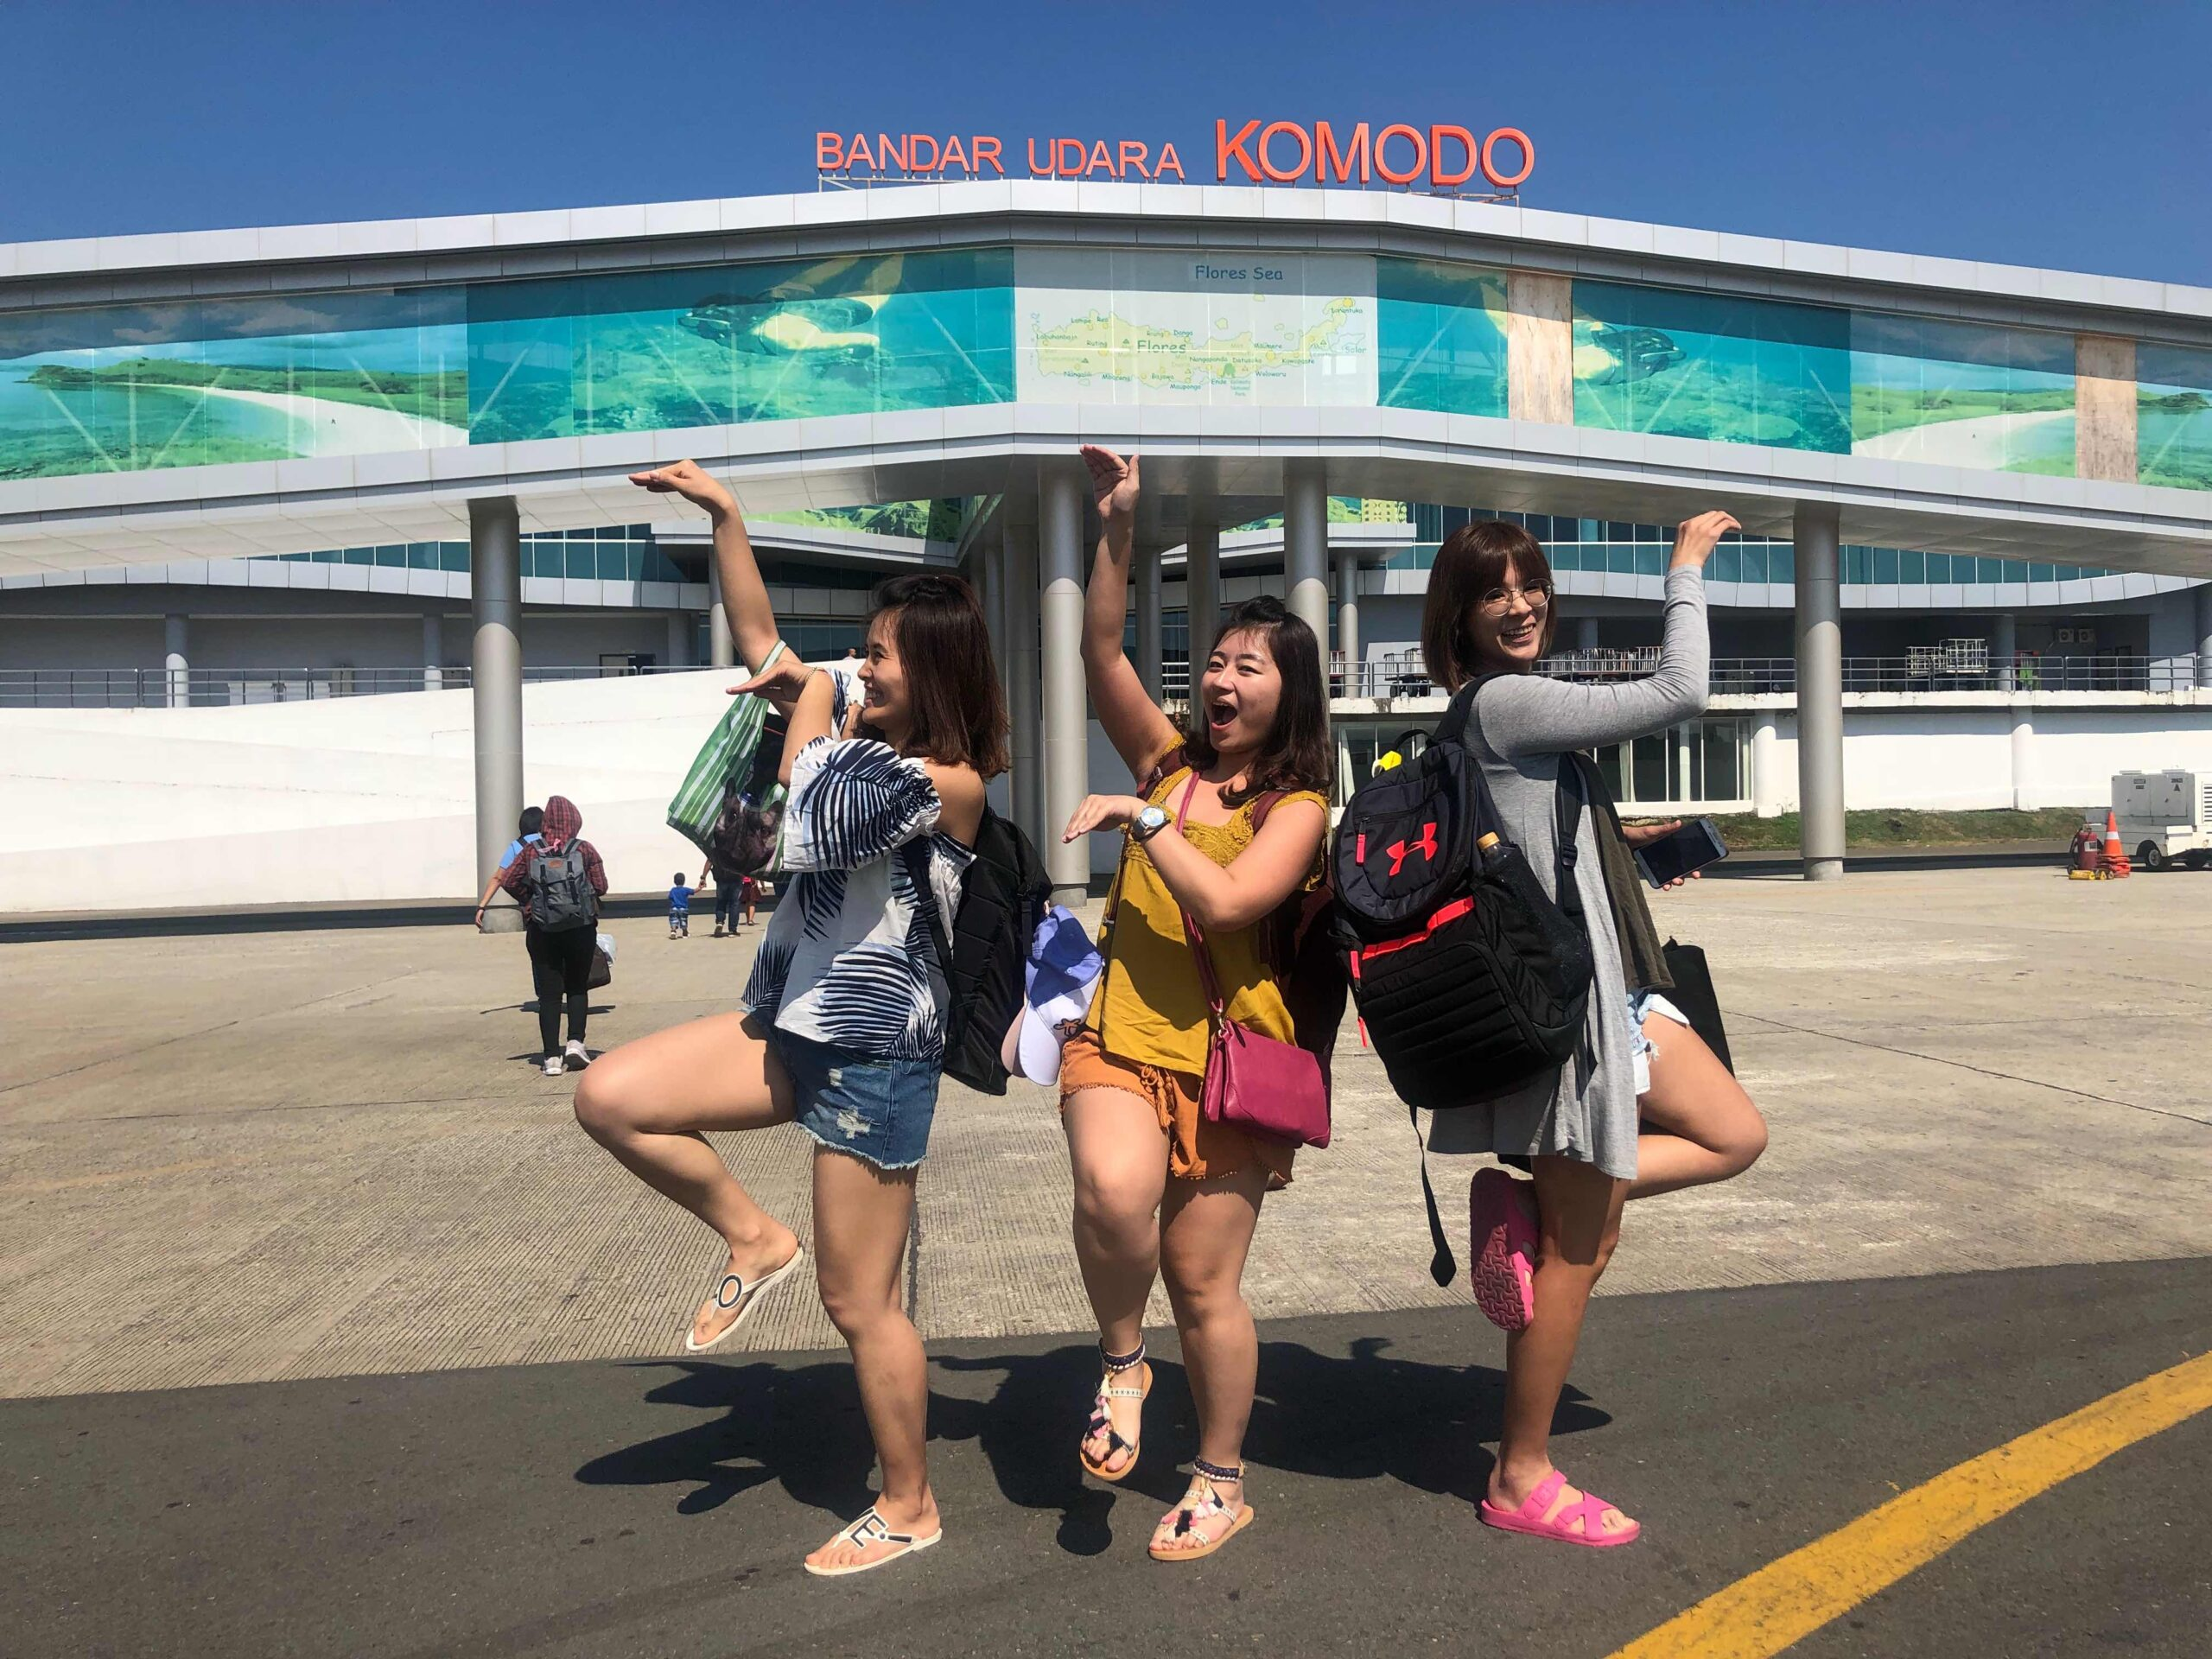 印尼||Komodo national park- 跳島行程-padar island*komodo dragon *pink beach